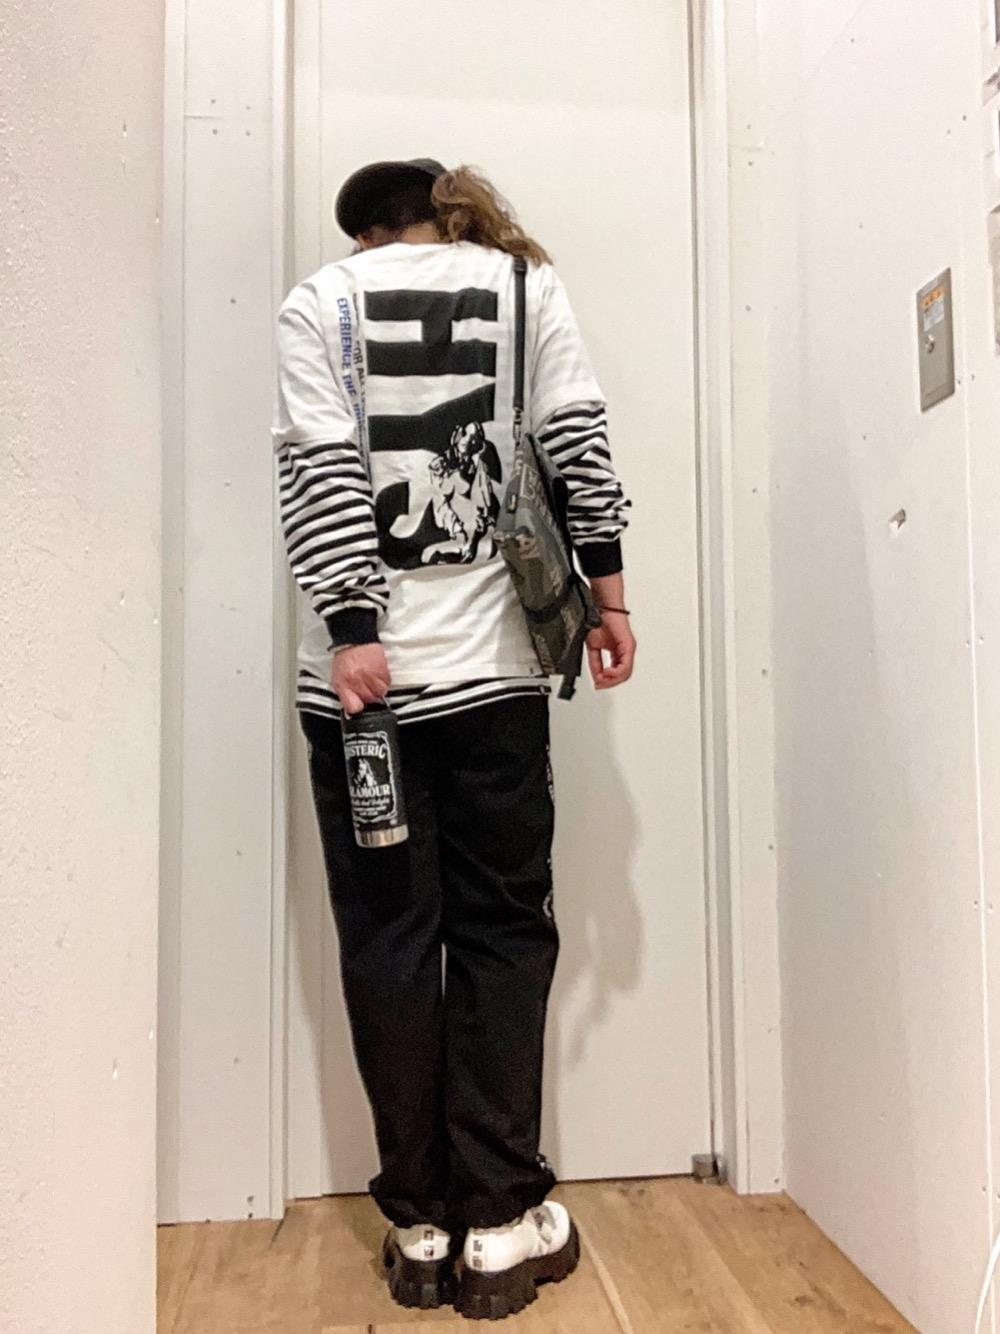 Tシャツ、背面、、1等賞候補!!w